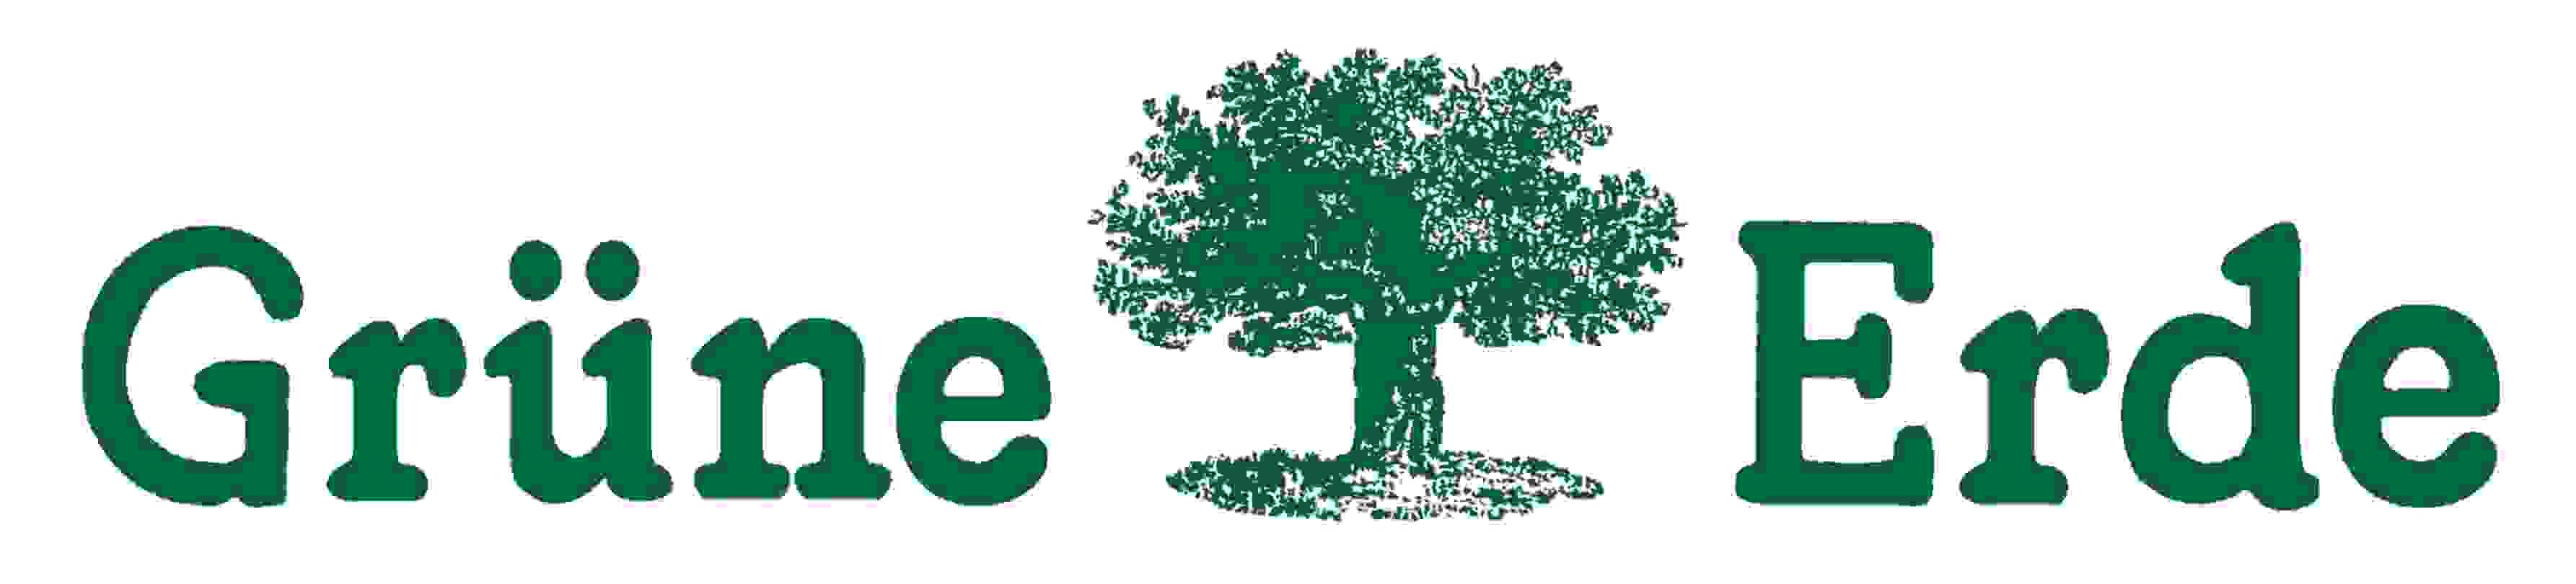 Guene Erde Logo